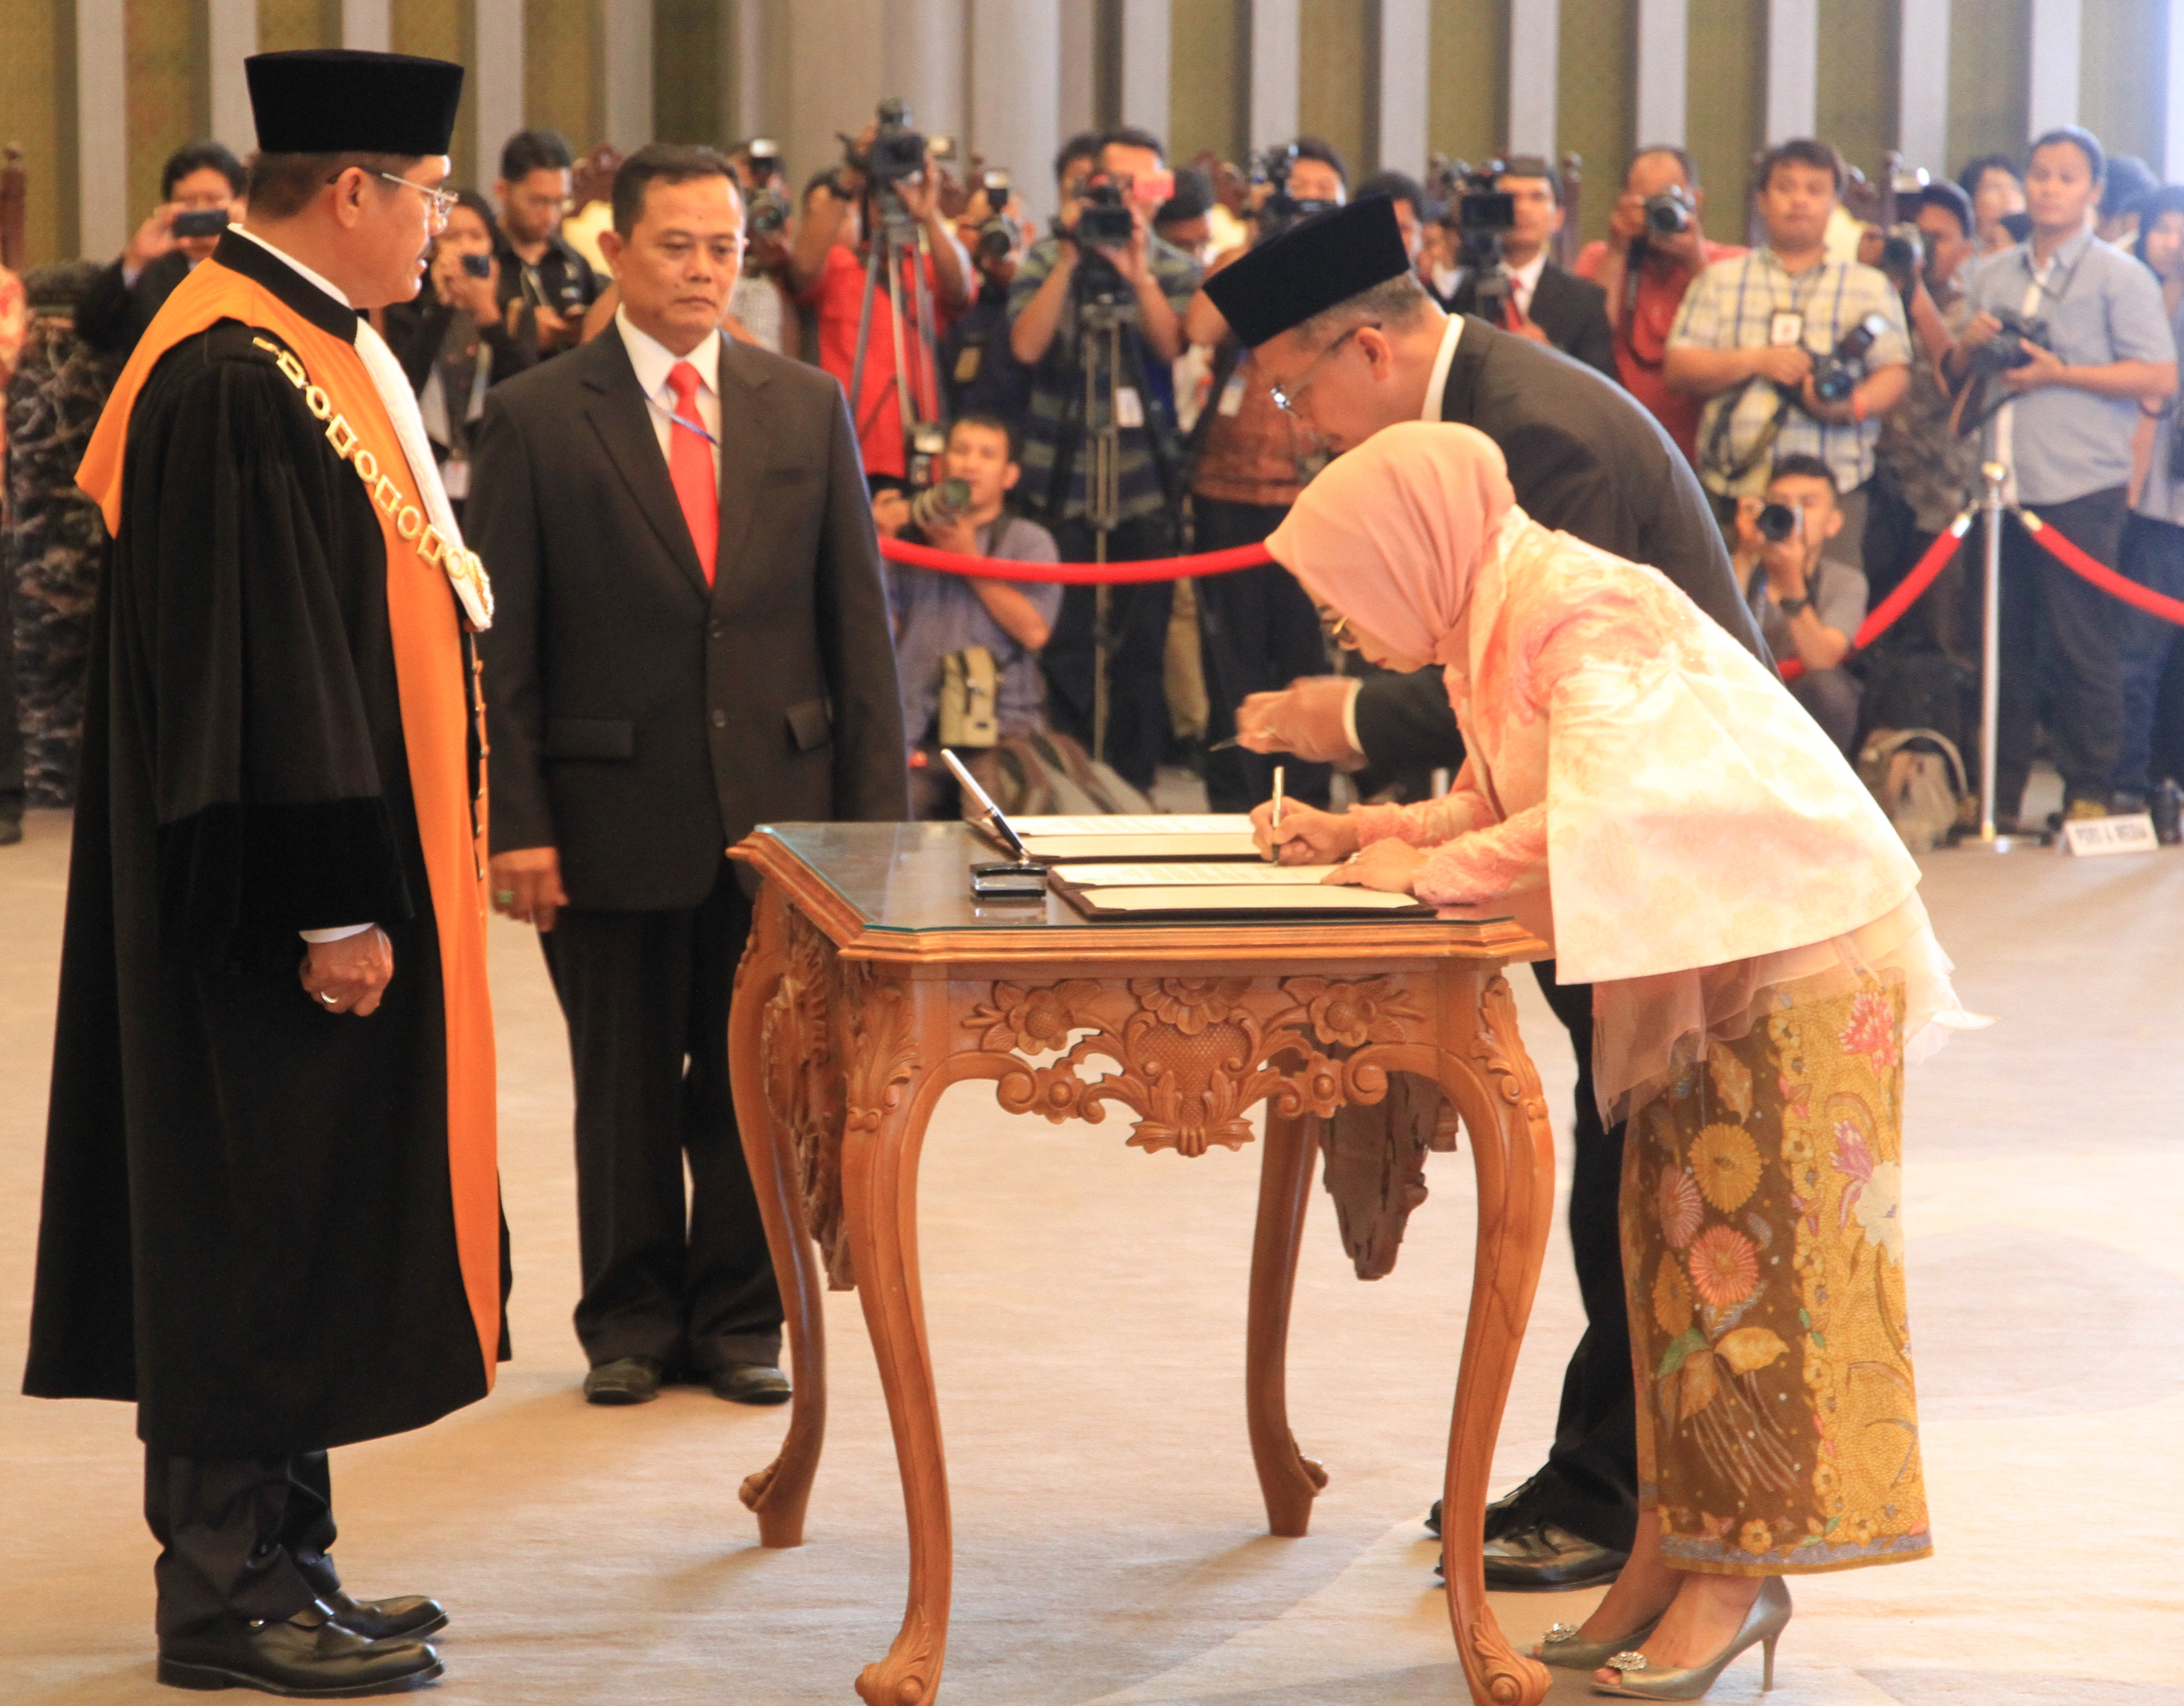 KETUA MAHKAMAH AGUNG MELANTIK DEPUTI GUBERNUR BANK INDONESIA